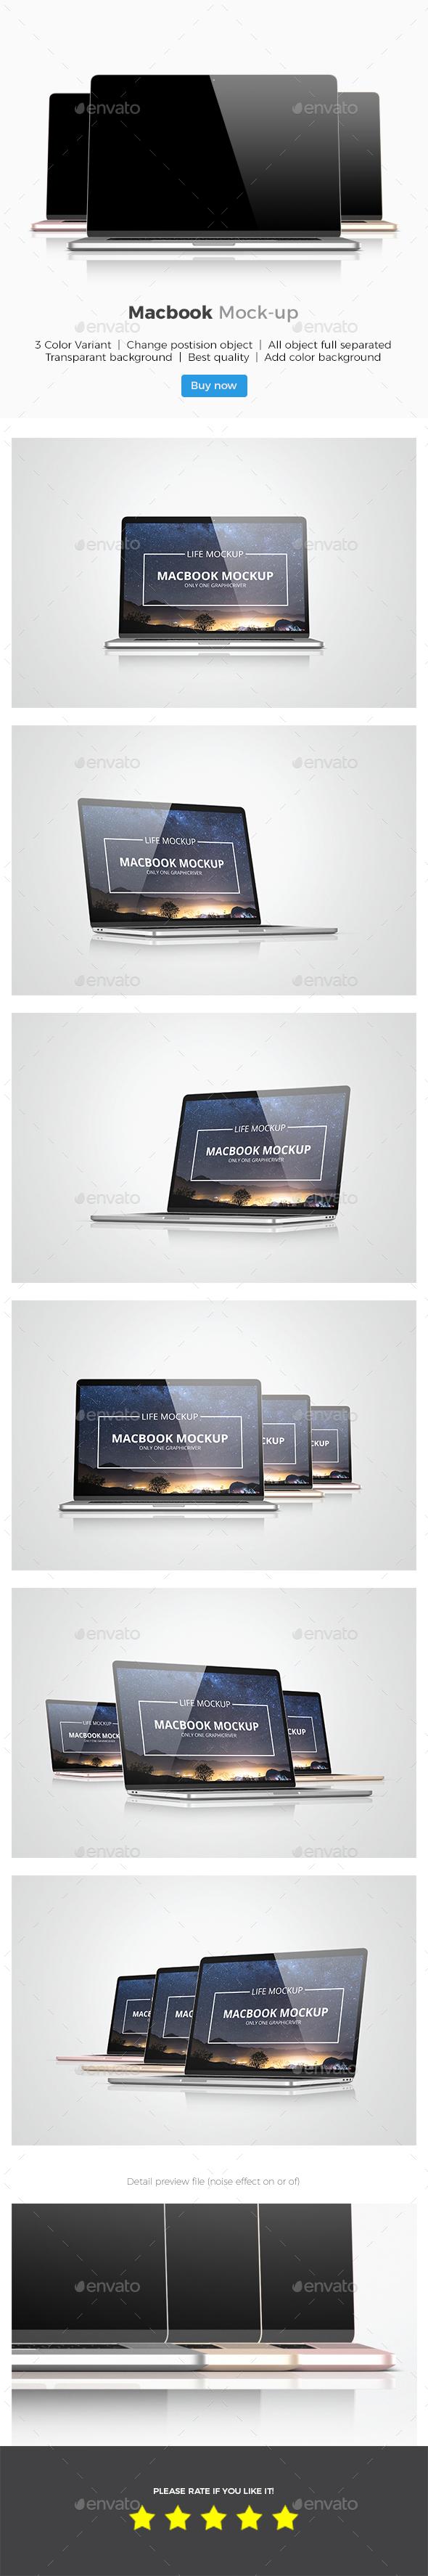 GraphicRiver Macbook Mockup 20988989